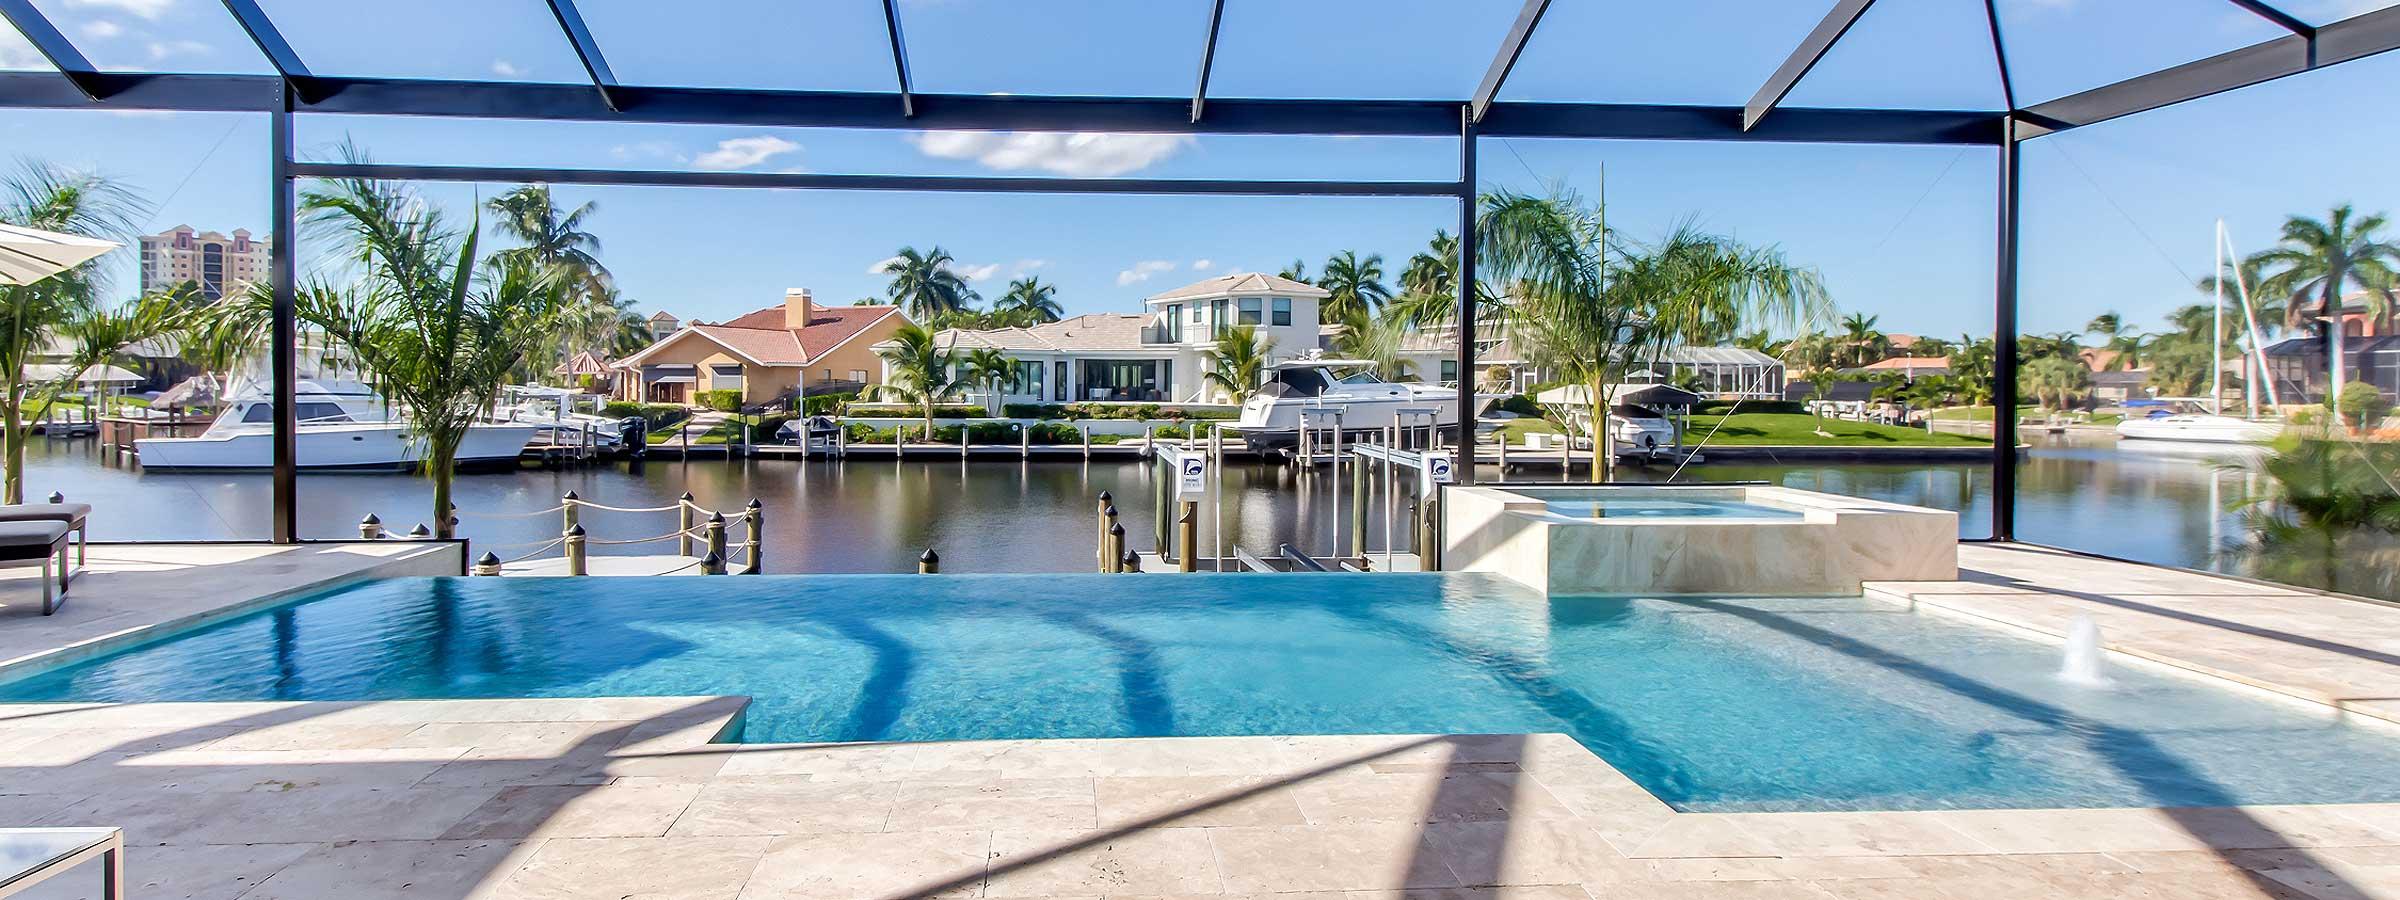 Renting a Florida Villa With an Inground Pool Makes Sense